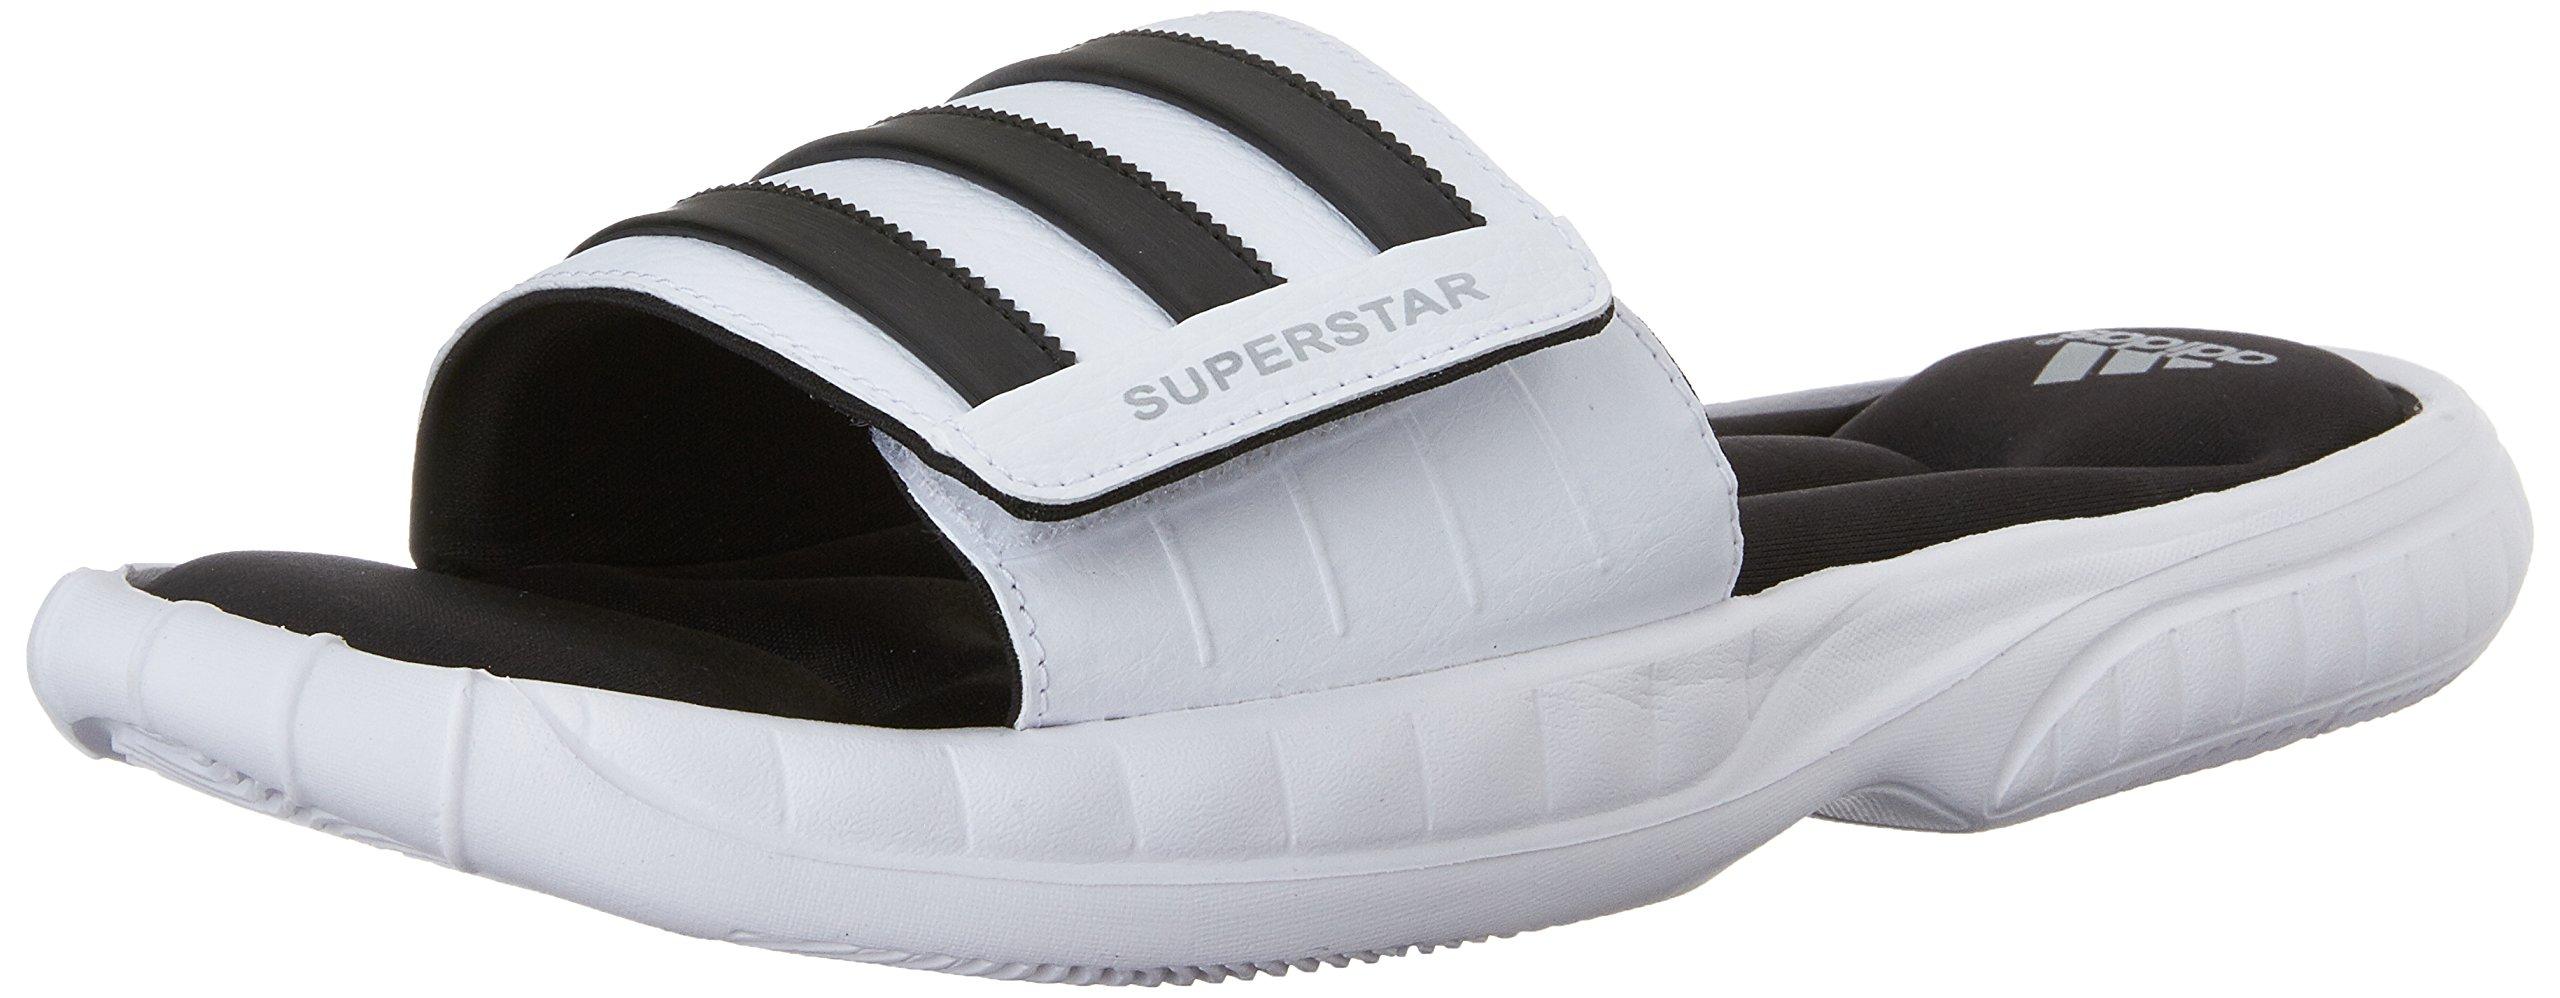 d98fedc7eb3262 Get Quotations · adidas Performance Men s Superstar 3G Slide Sandal